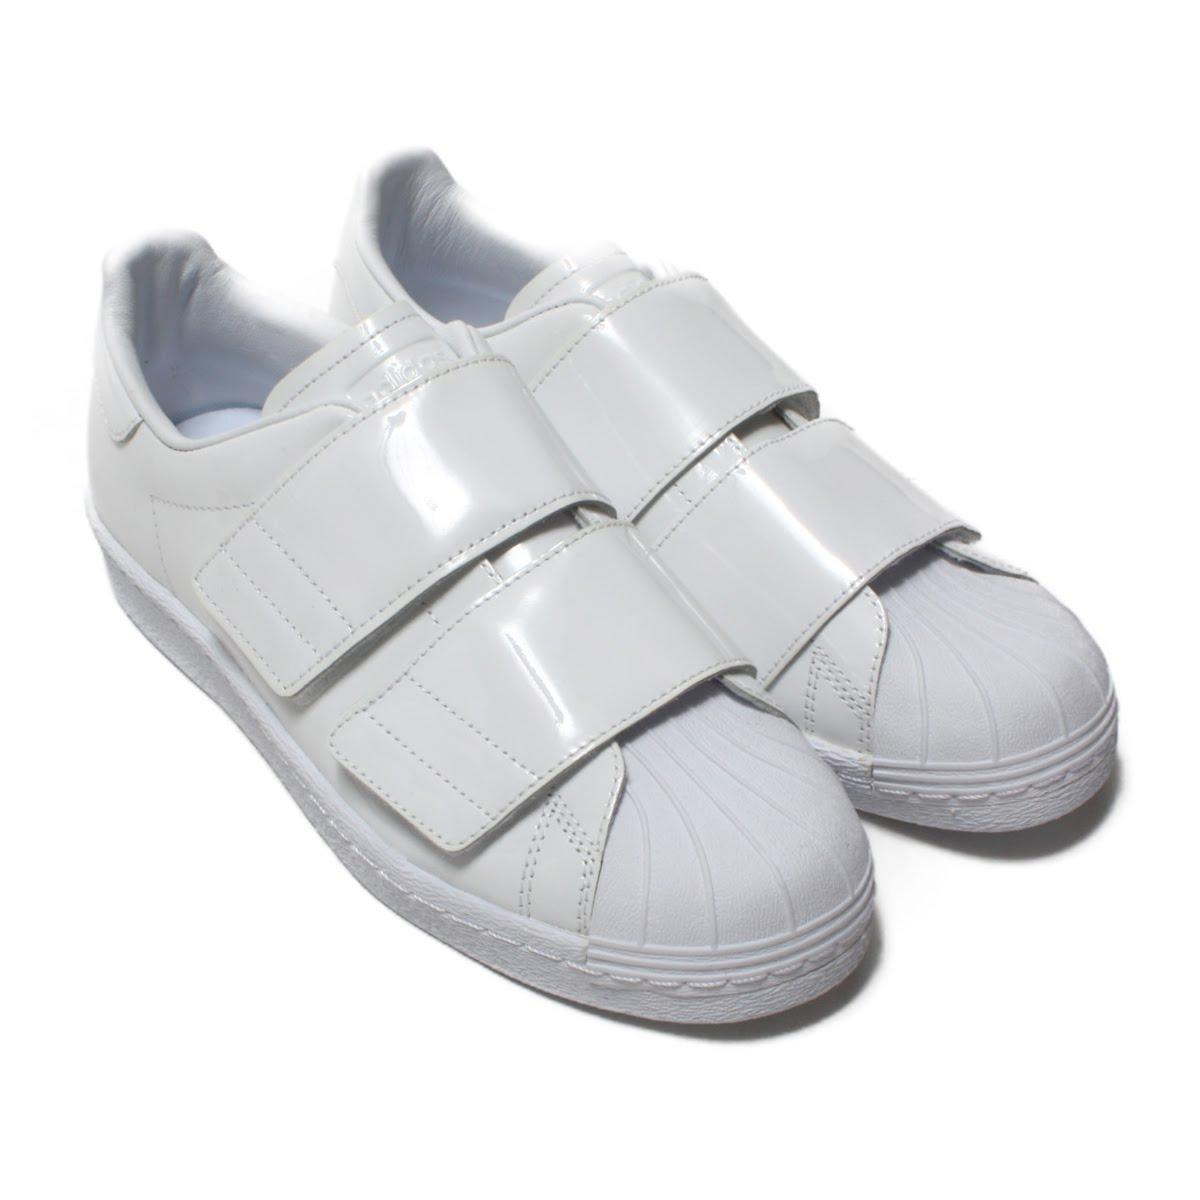 adidas Originals SS 80s CF W(アディダス オリジナルス スーパースター80s CF W)RUNNING WHITE/RUNNING WHITE/RUNNING WHITE【メンズ レディース スニーカー】18FW-I